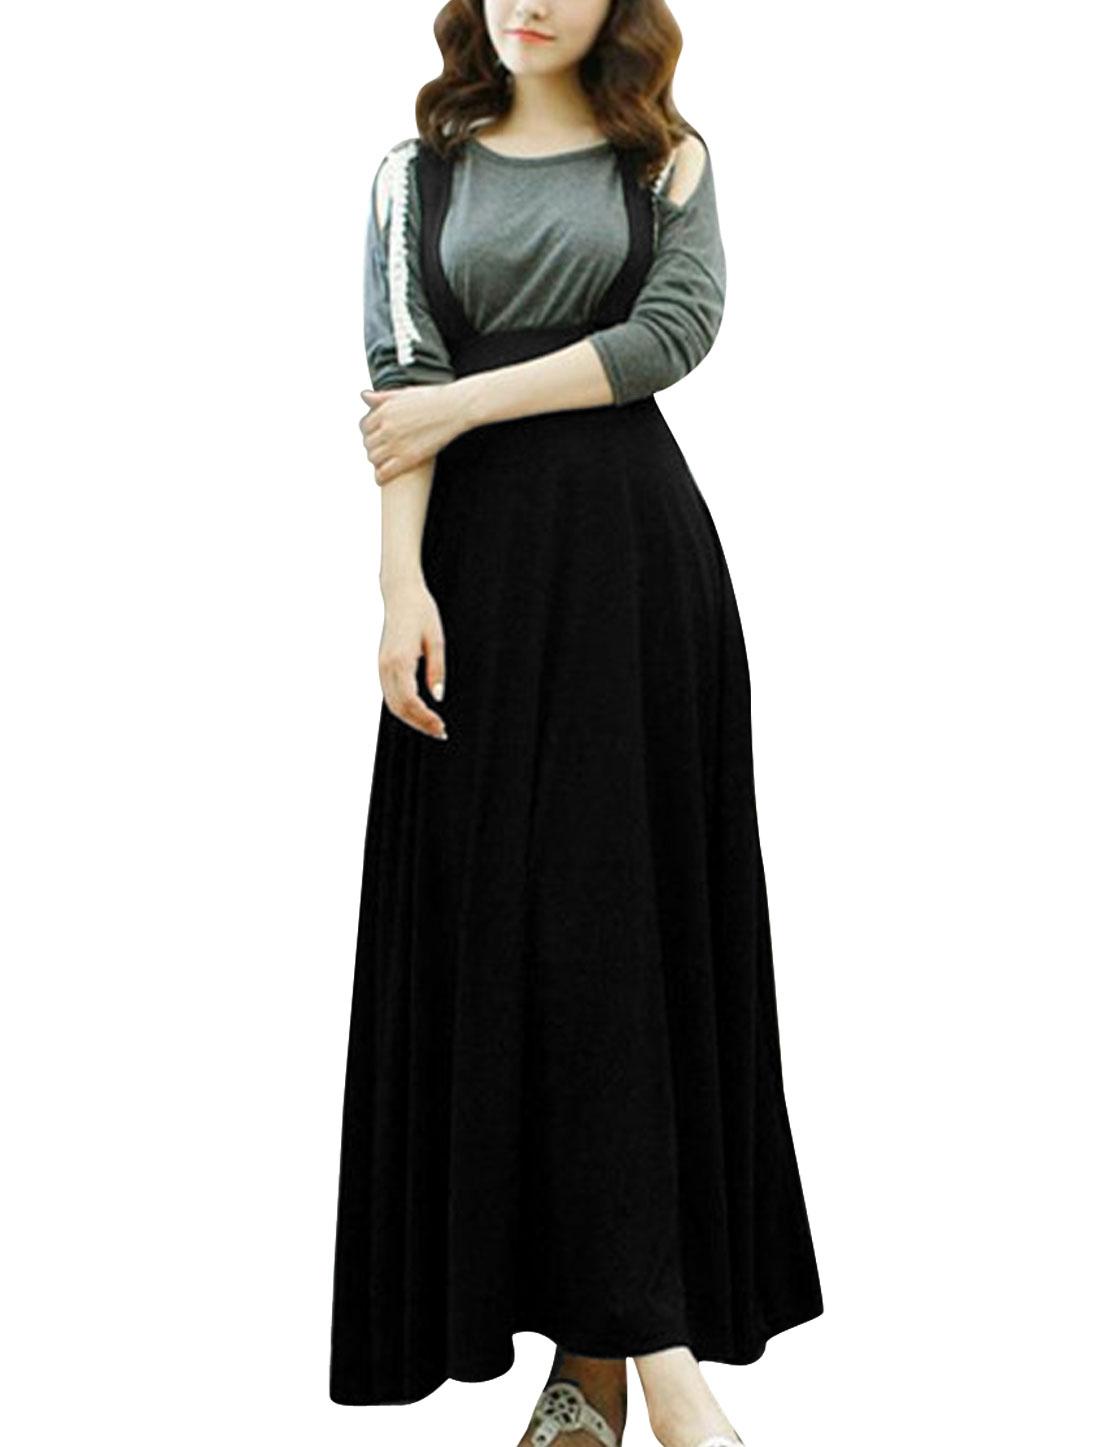 Lady Elastic Waist Mid Calf Crossover Back Suspender Skirt Black M